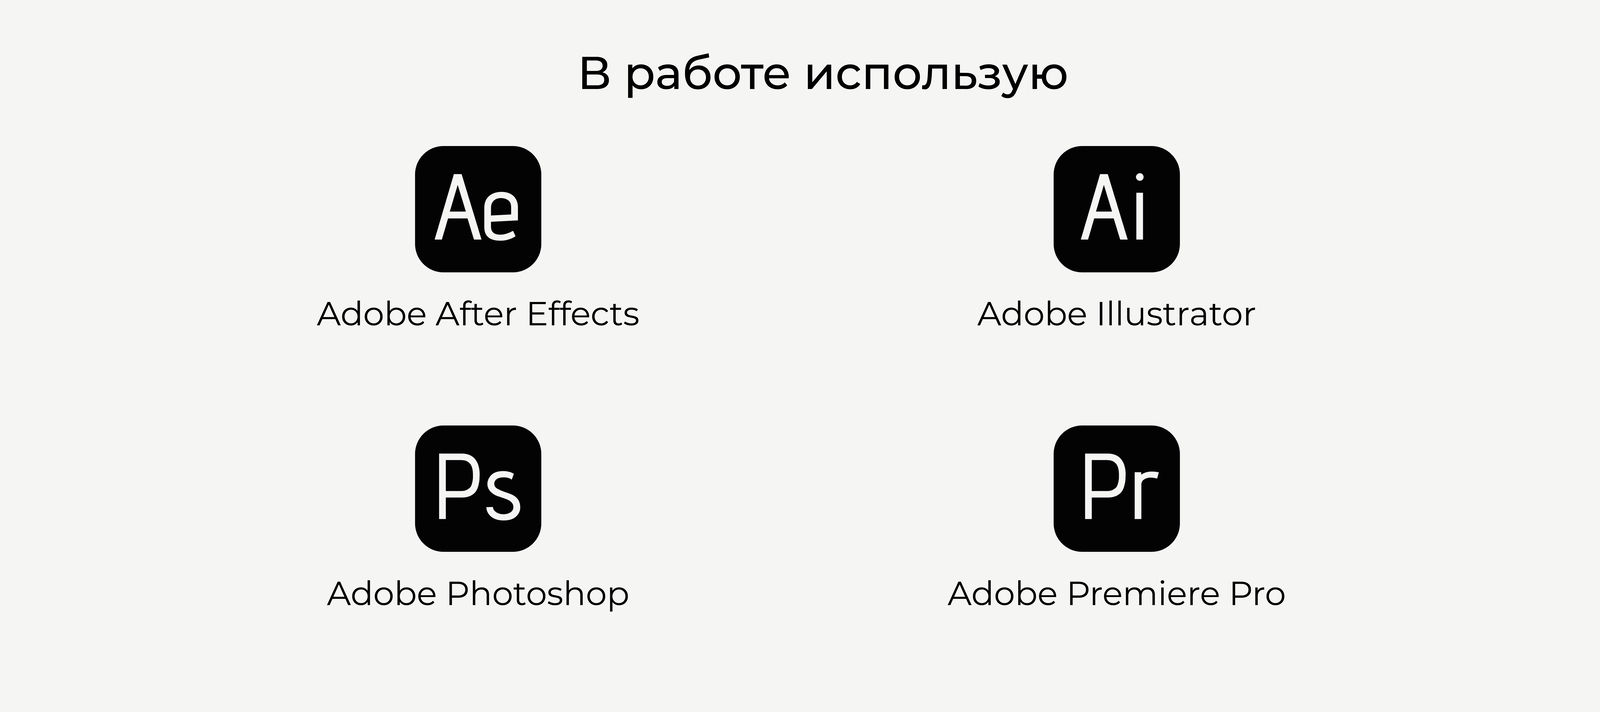 Использую в работе: Adobe After Effects, Adobe Illustrator, Adobe Photoshop, Adobe Premiere Pro